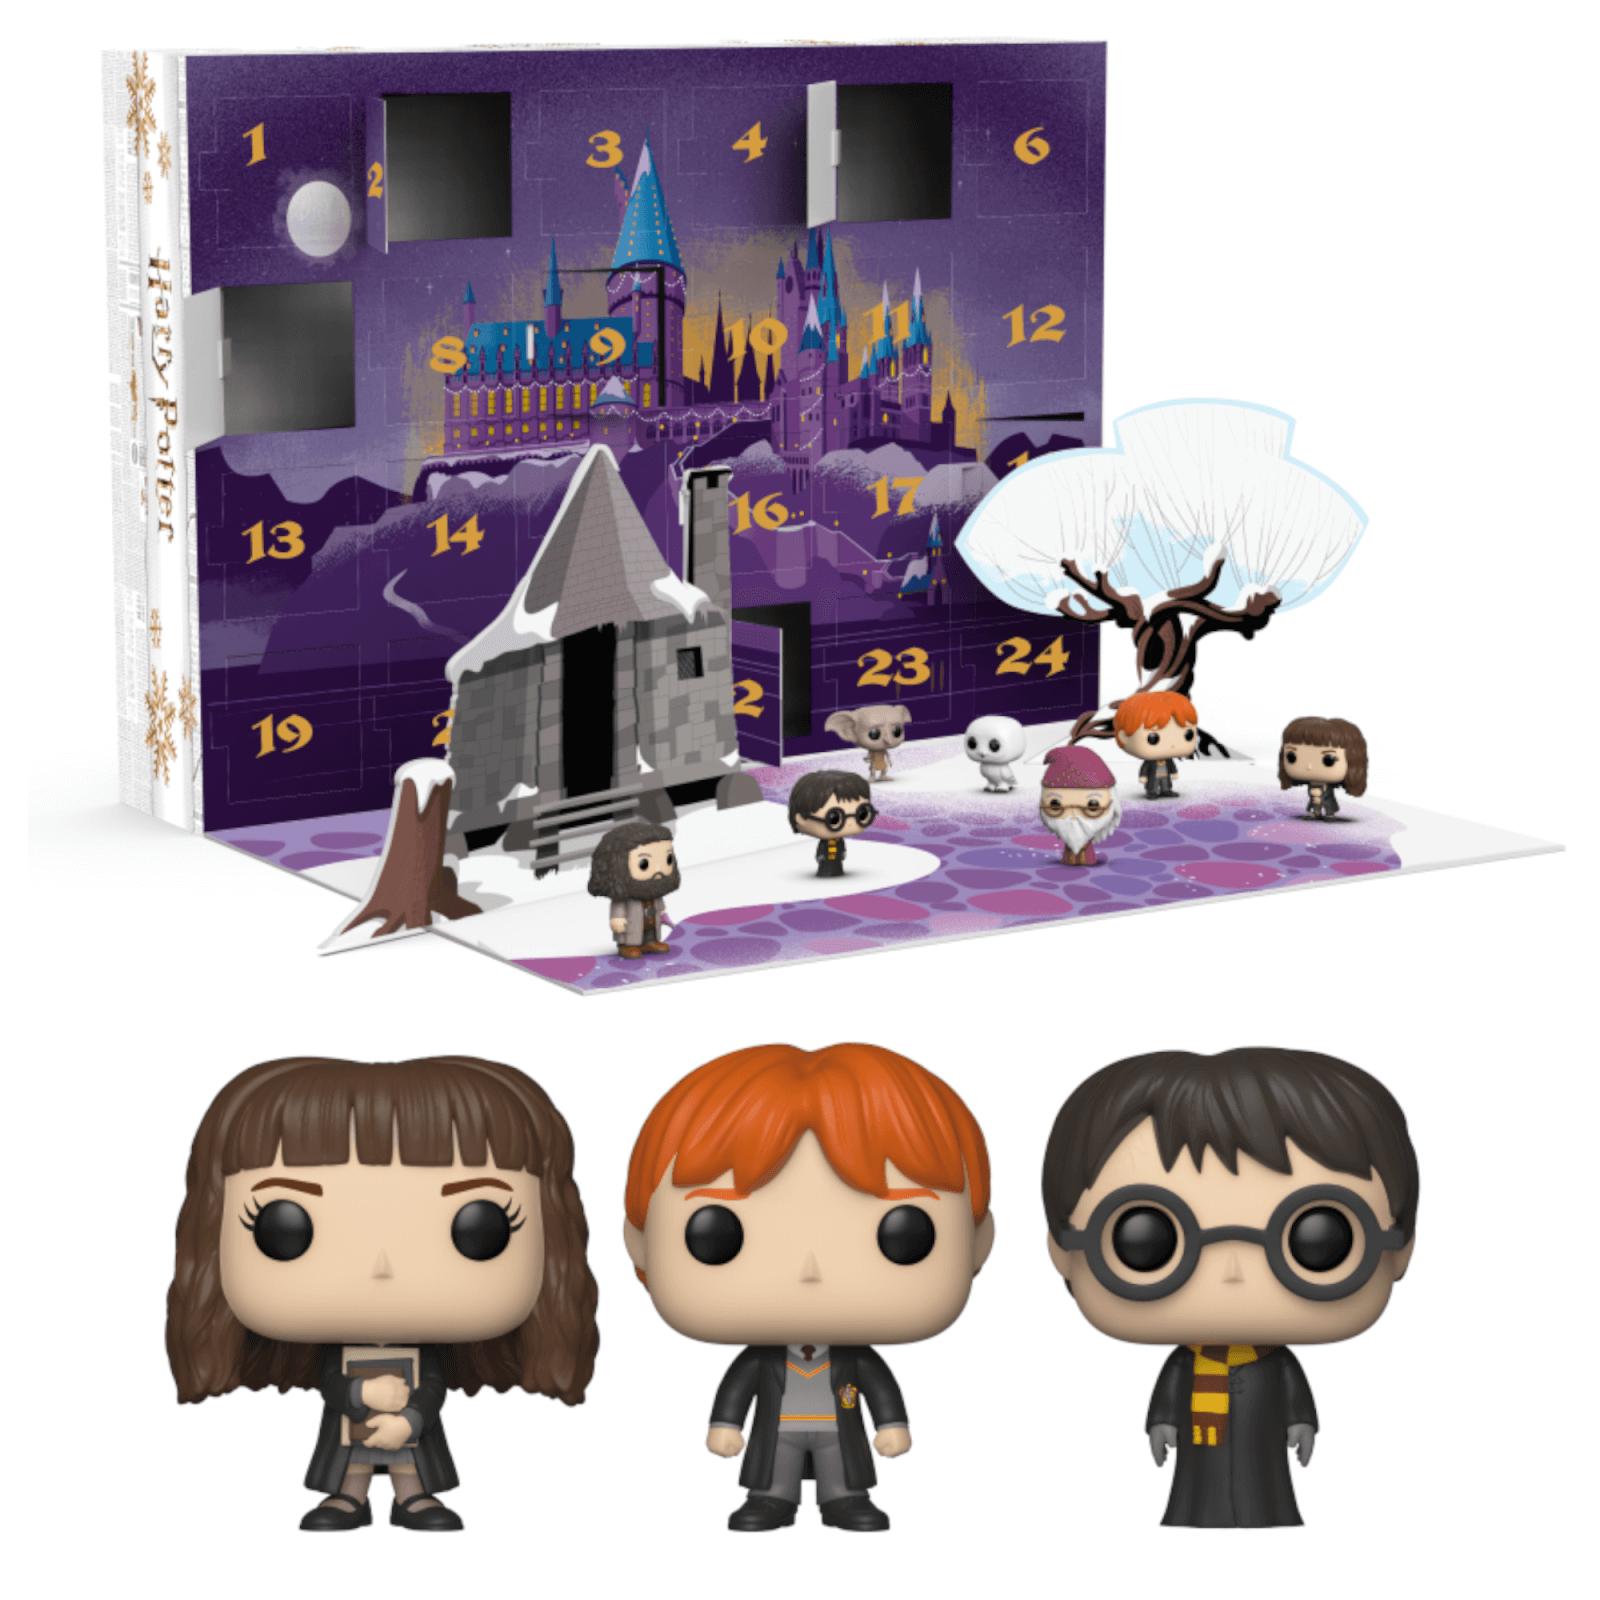 Funko Pop! saca un calendario de adviento de Harry Potter - Juguetes Harry Potter